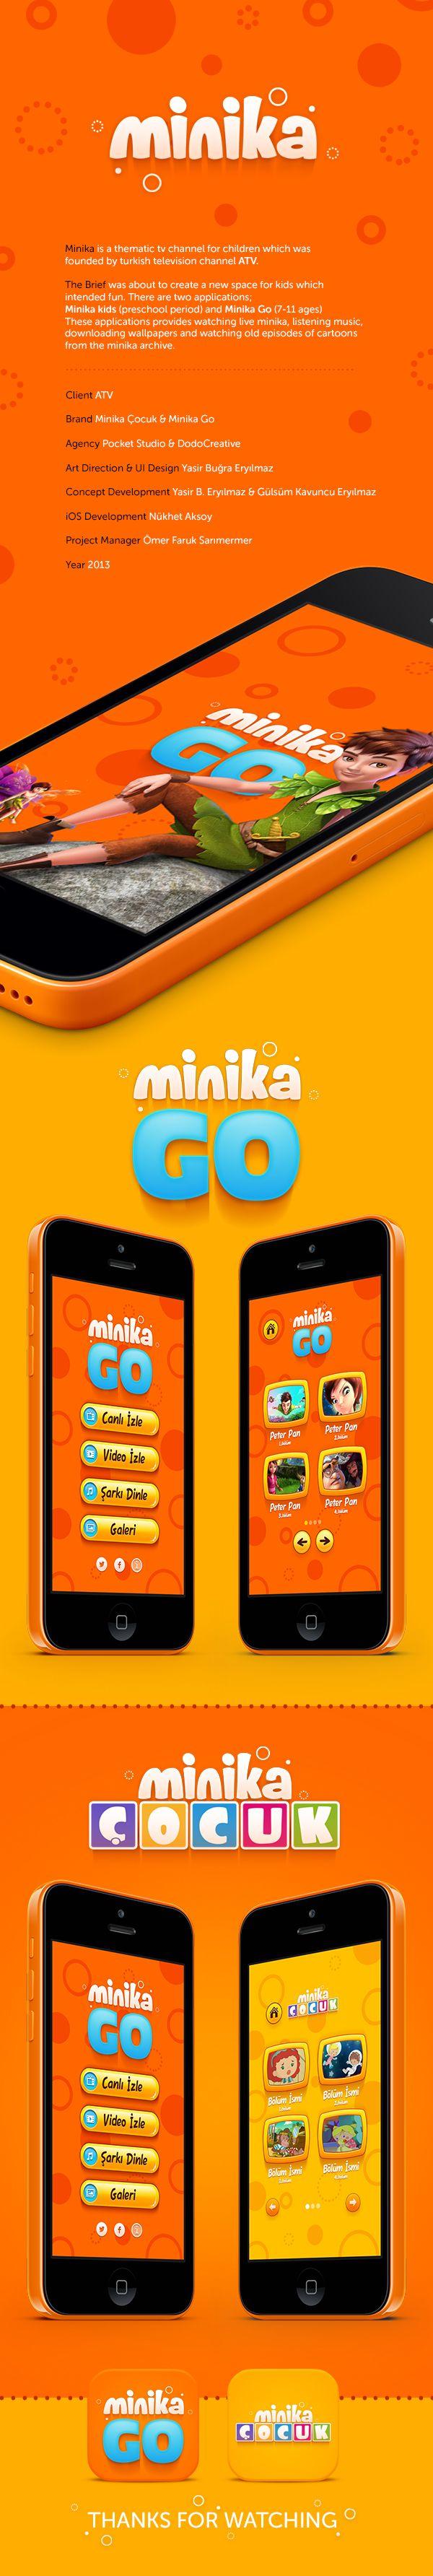 Minika App by Yasir Buğra Eryılmaz, via Behance